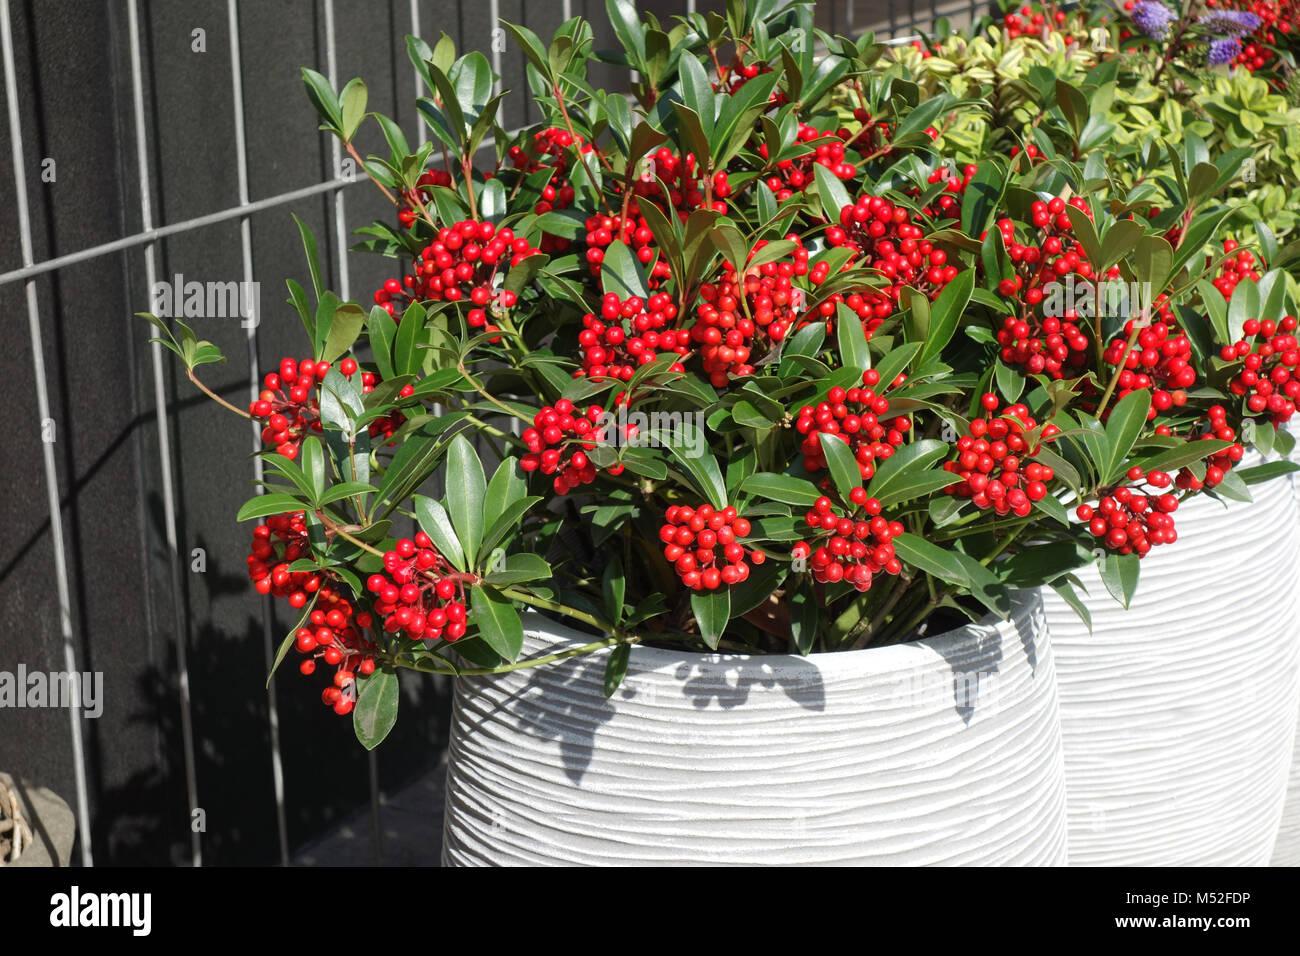 skimmia japonica flowers stockfotos skimmia japonica flowers bilder alamy. Black Bedroom Furniture Sets. Home Design Ideas